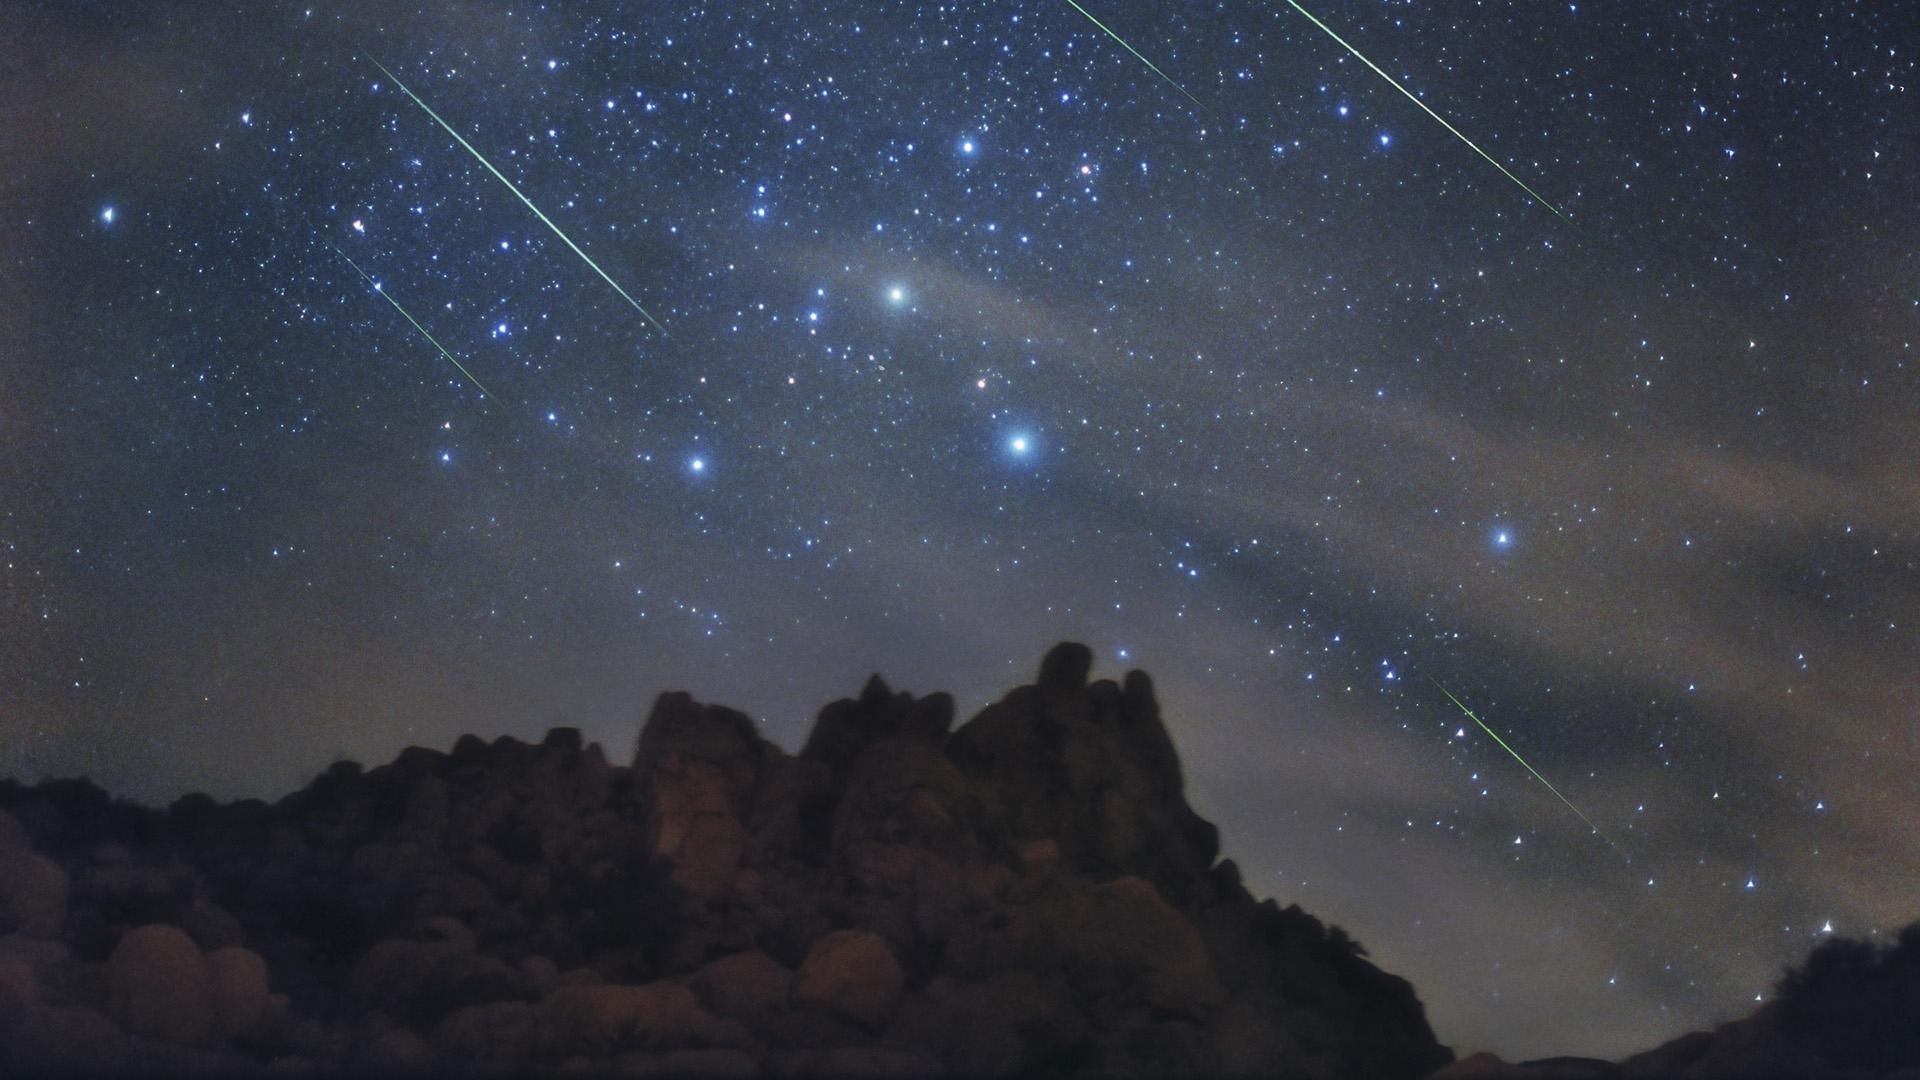 Shooting Stars wallpaper   677919 1920x1080